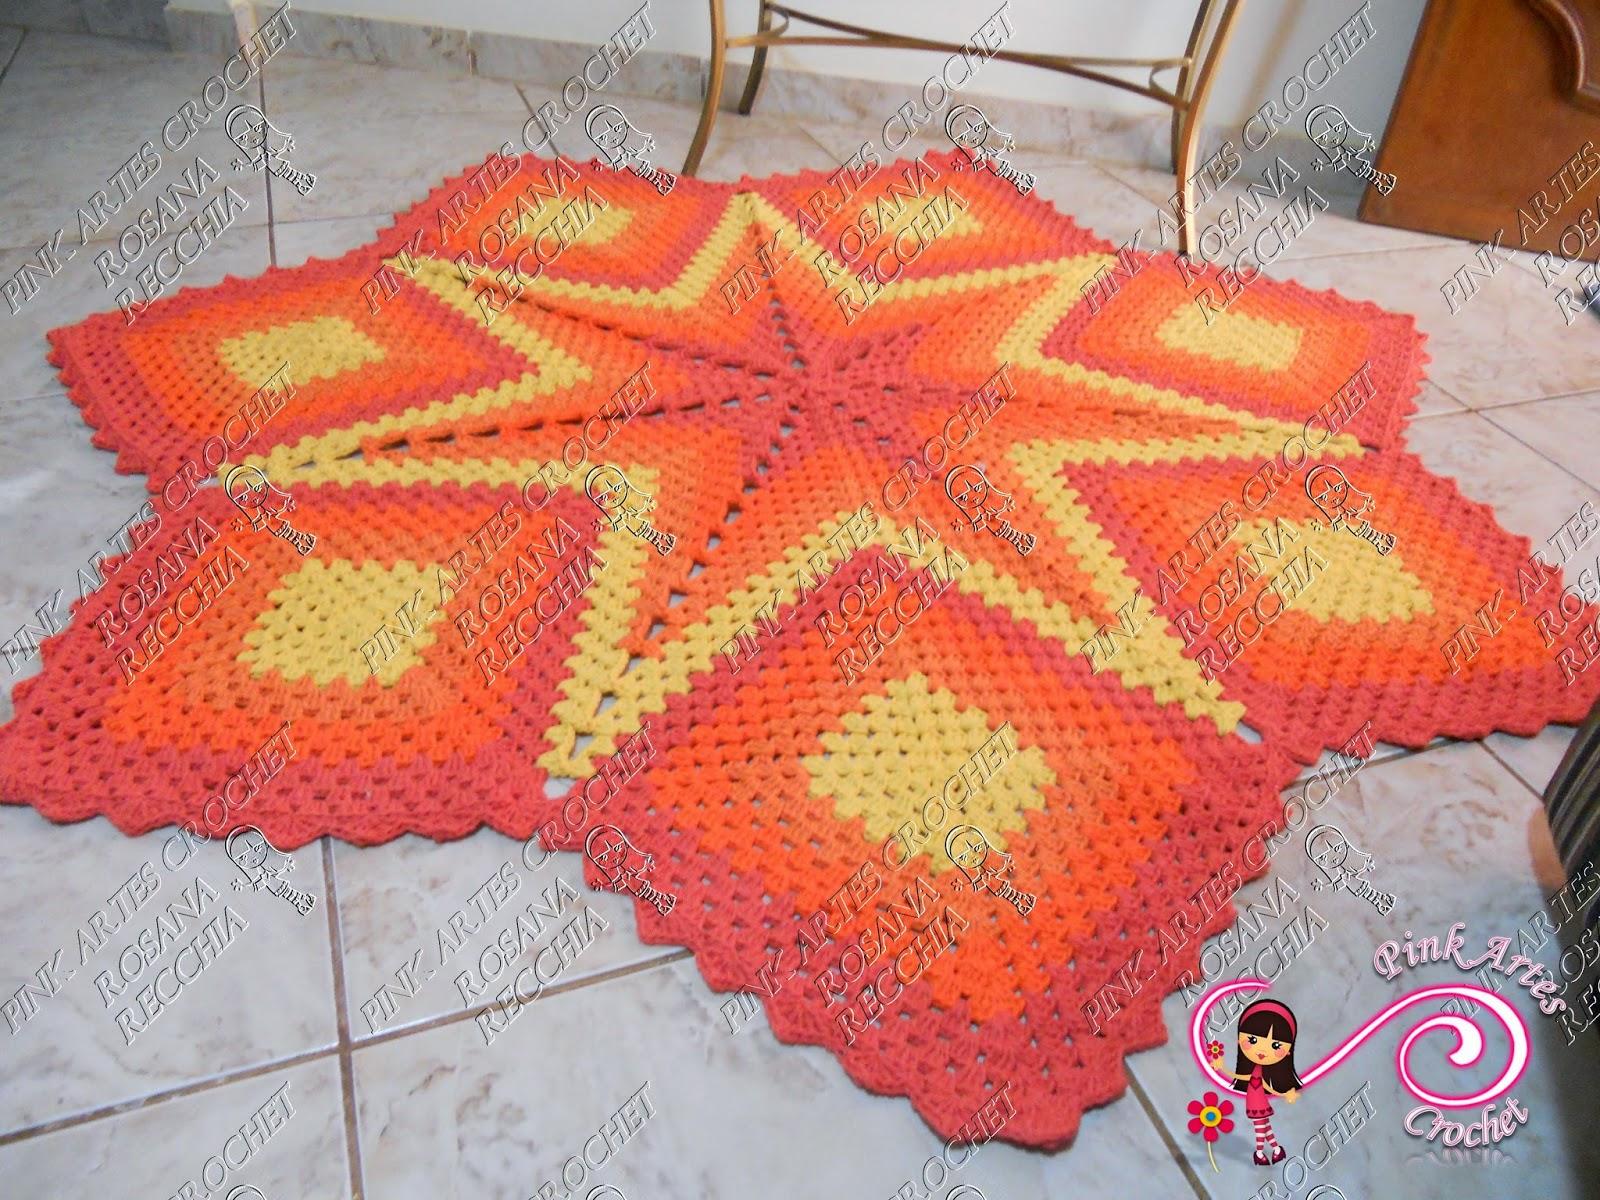 Pink Artes Croche Tapete Centro De Sala Estrela -> Tapete Pra Sala De Croche